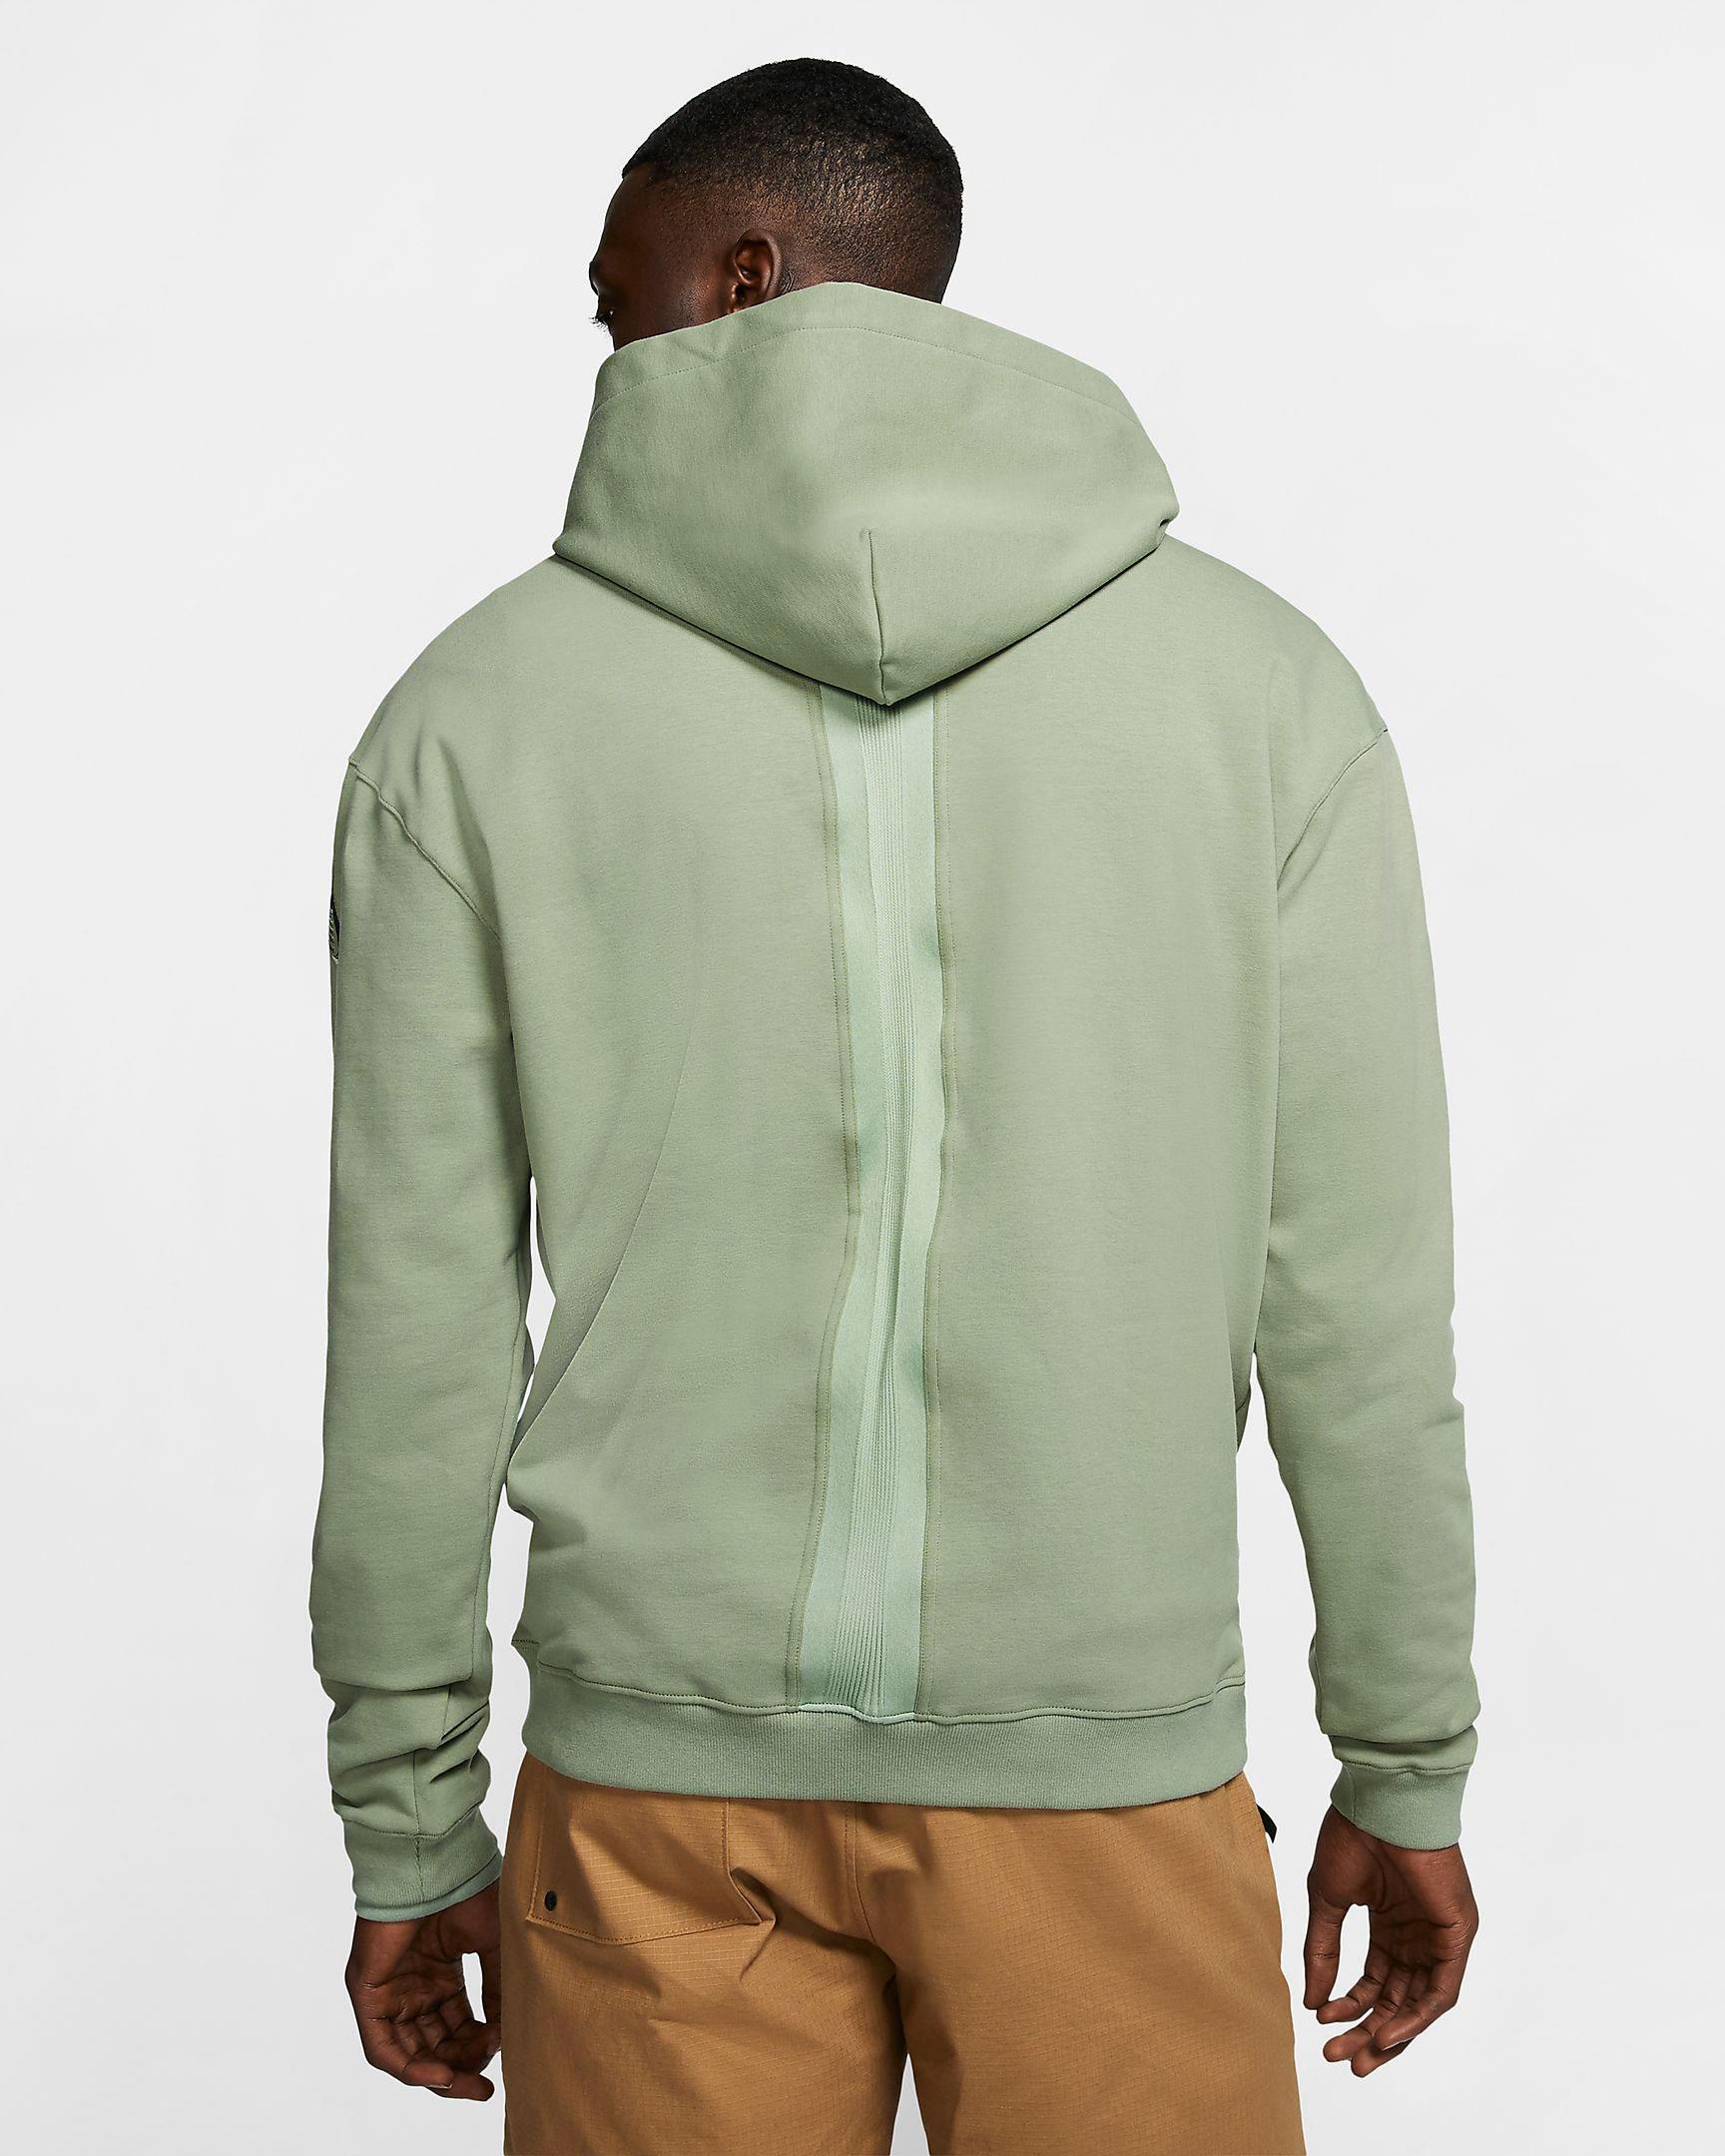 nike-lebron-john-elliott-hoodie-green-2